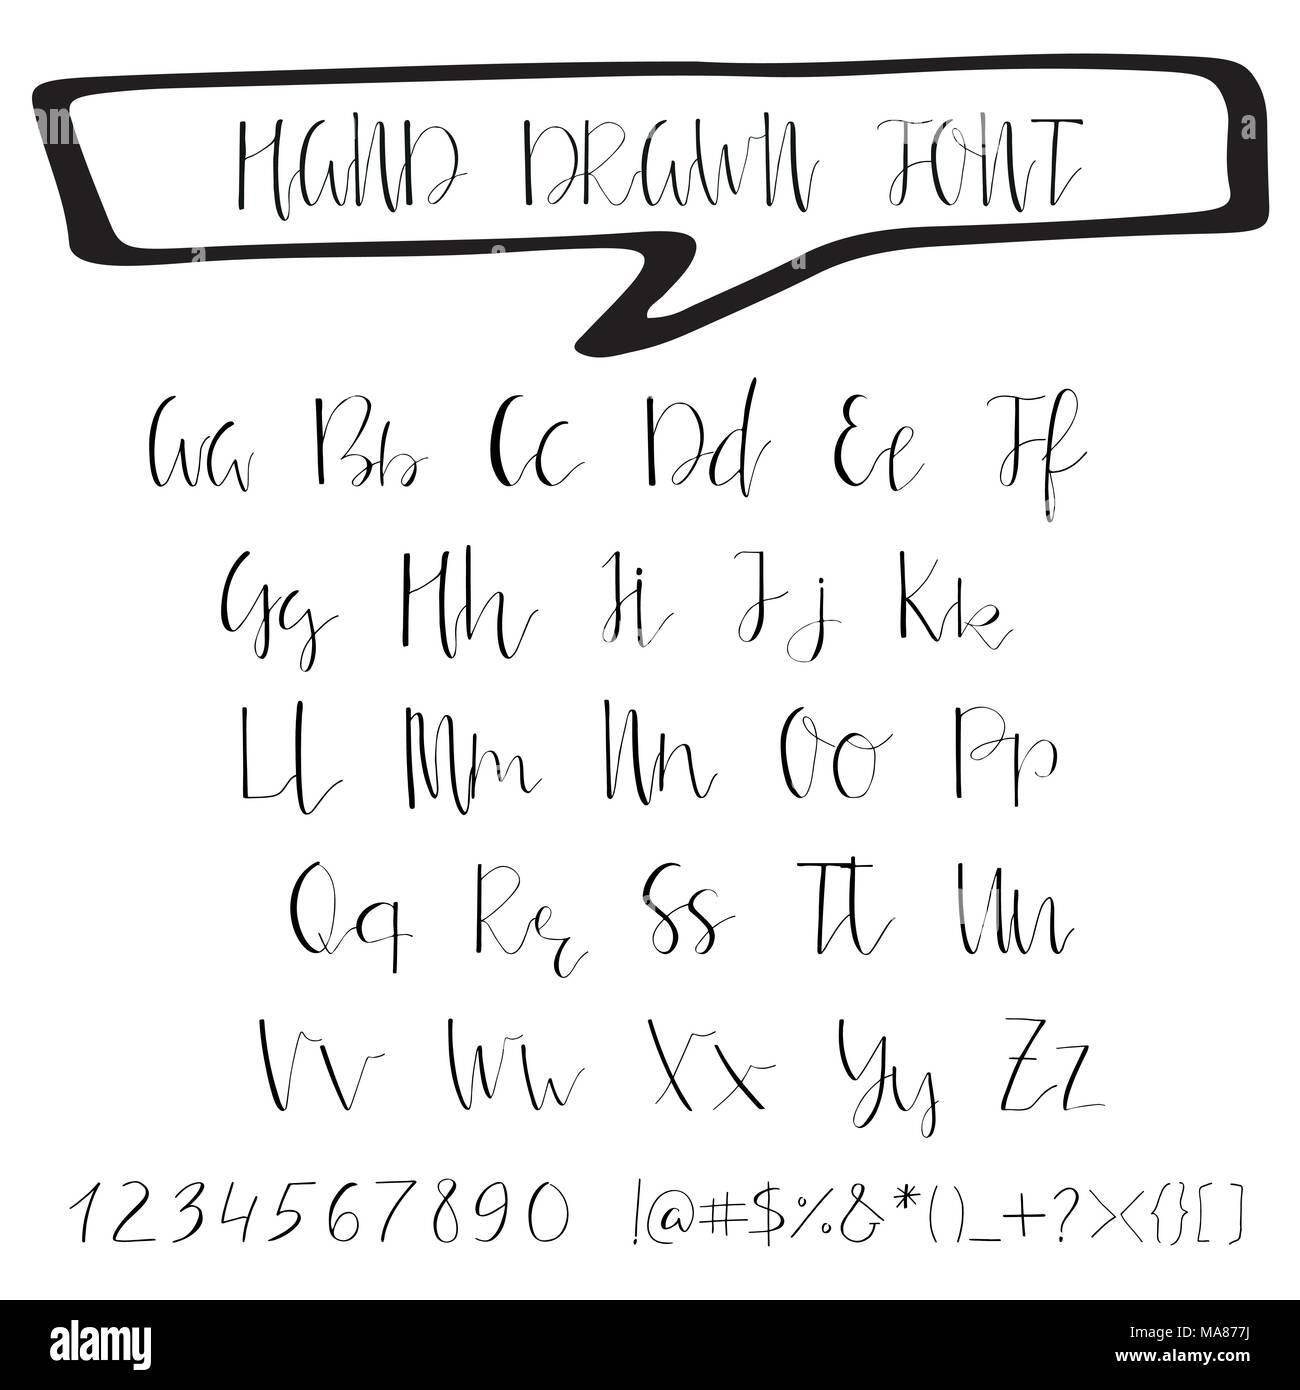 Handwritten calligraphy ink font unique alphabet isolated letters handwritten calligraphy ink font unique alphabet isolated letters can be used for wedding invitation menu save the date postcard poster decora stopboris Gallery